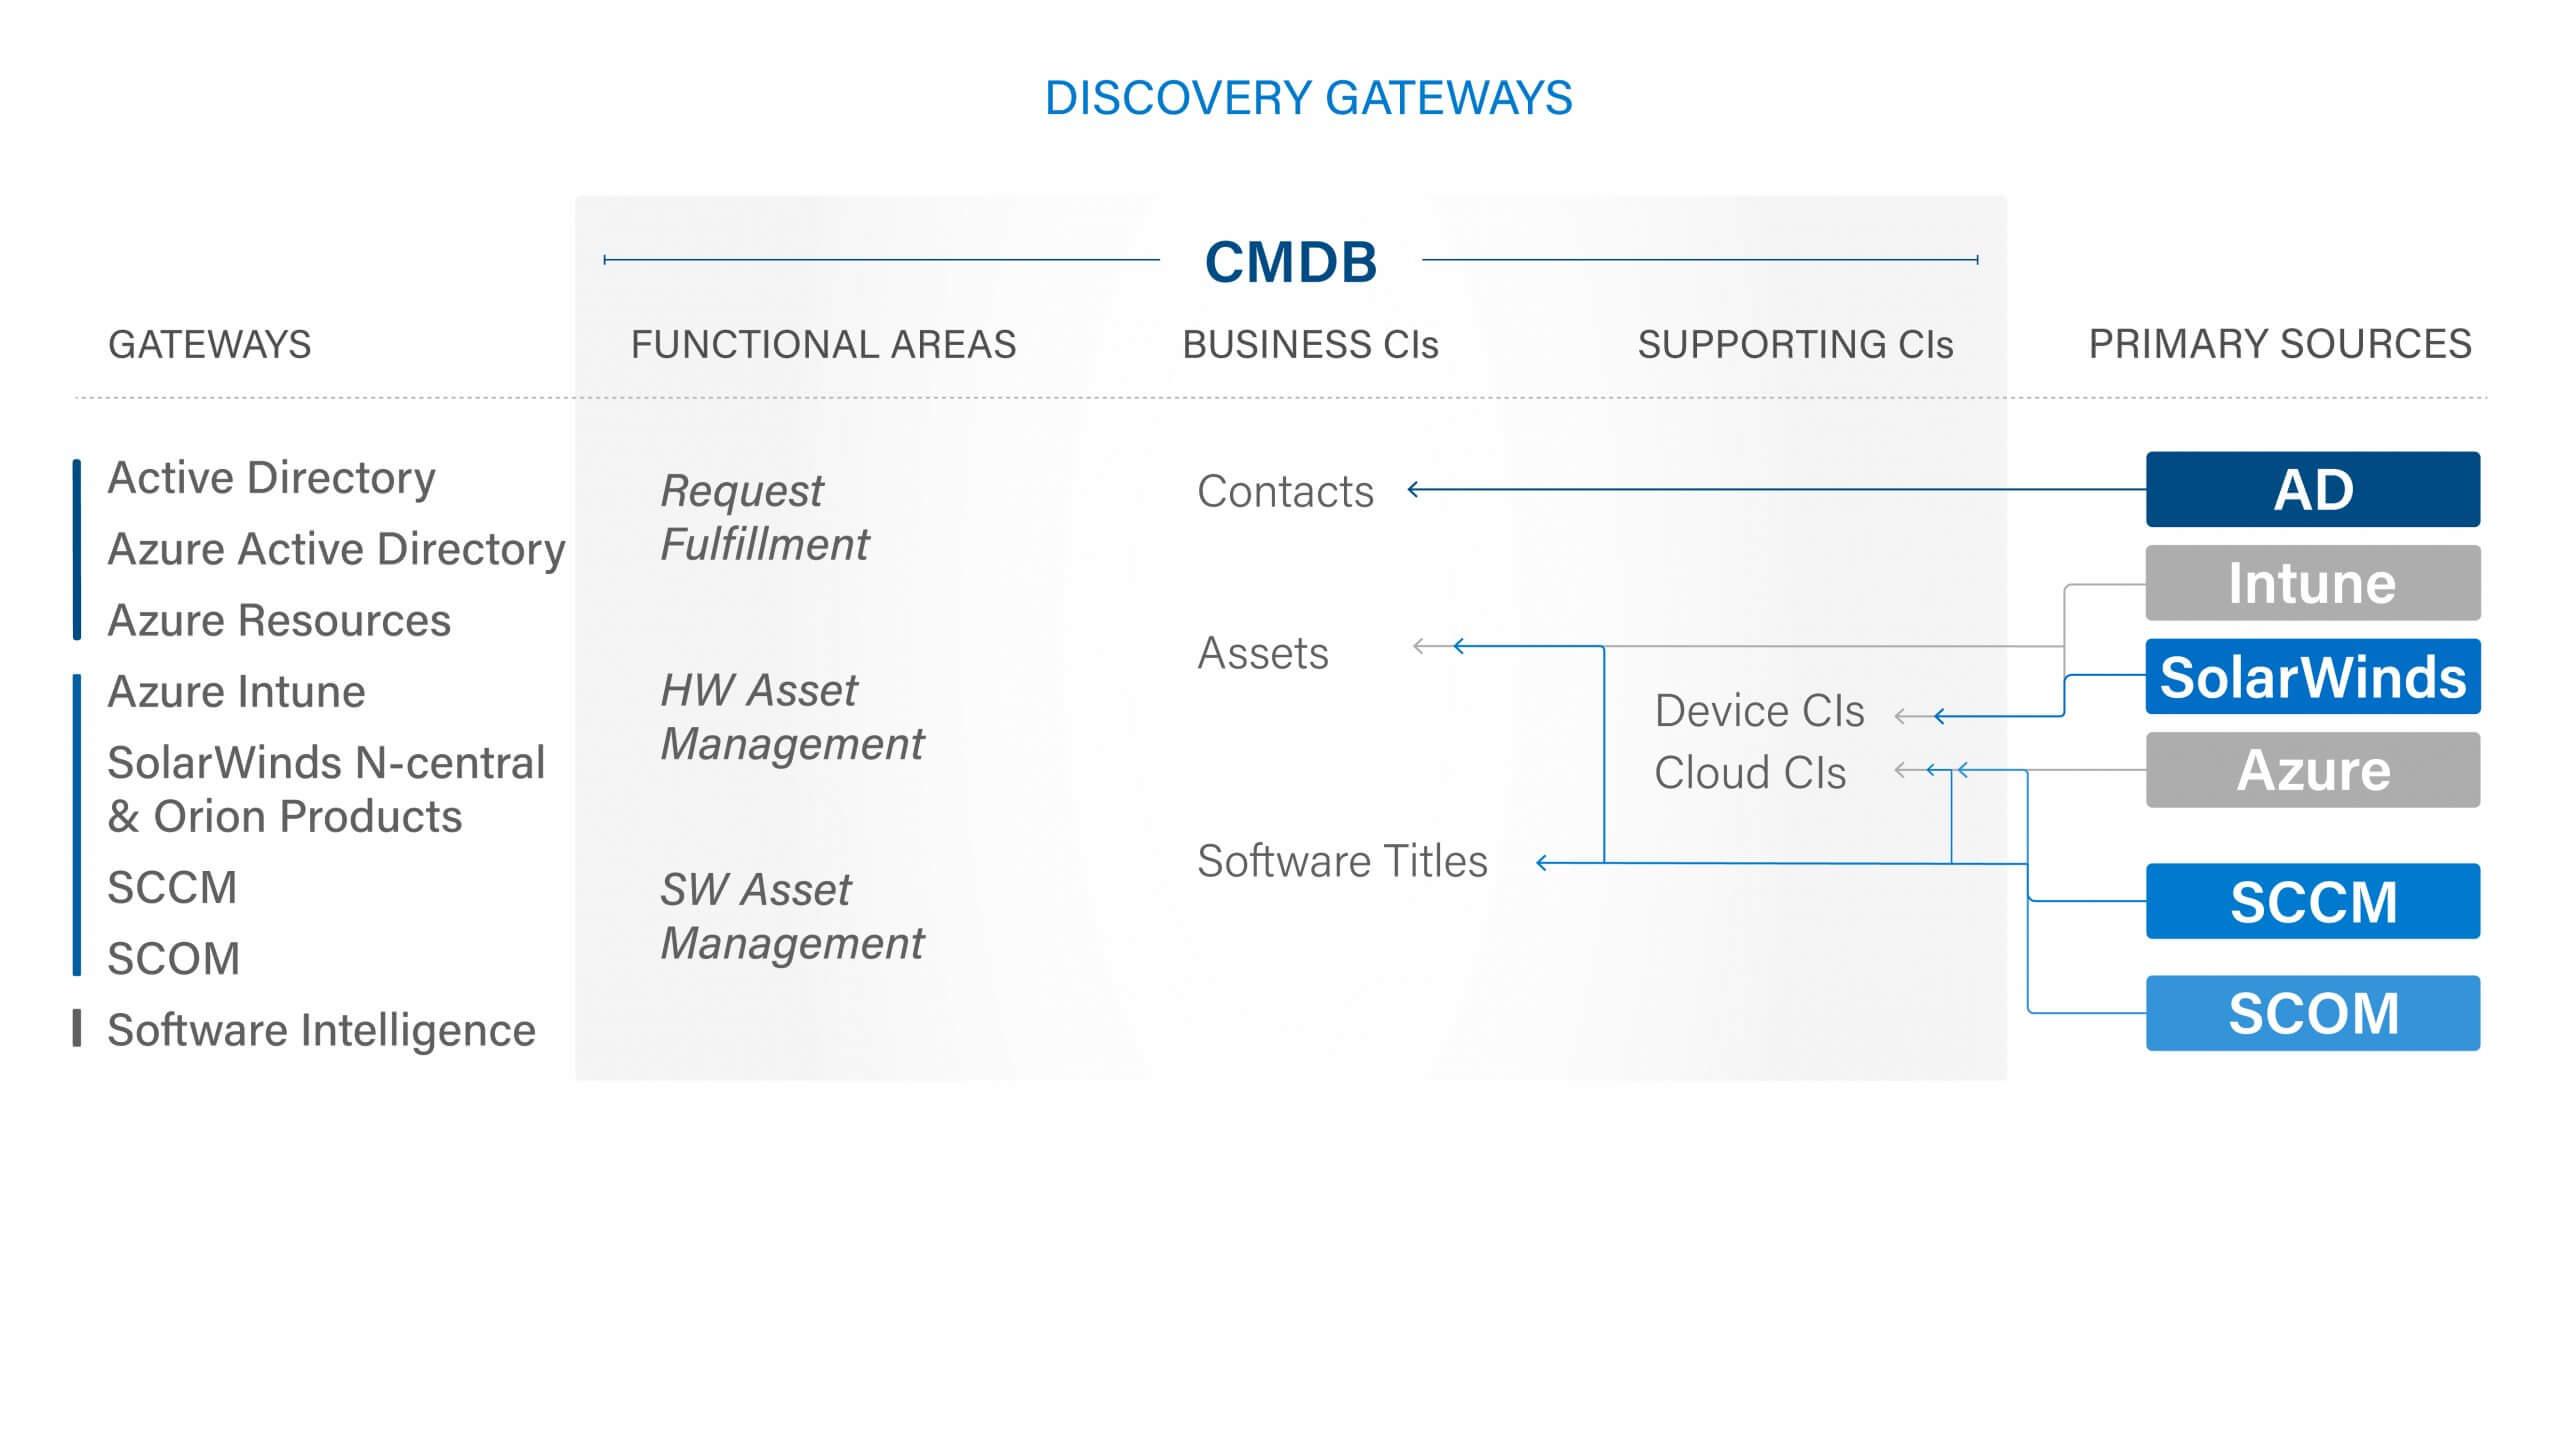 Discovery Gateways Diagram